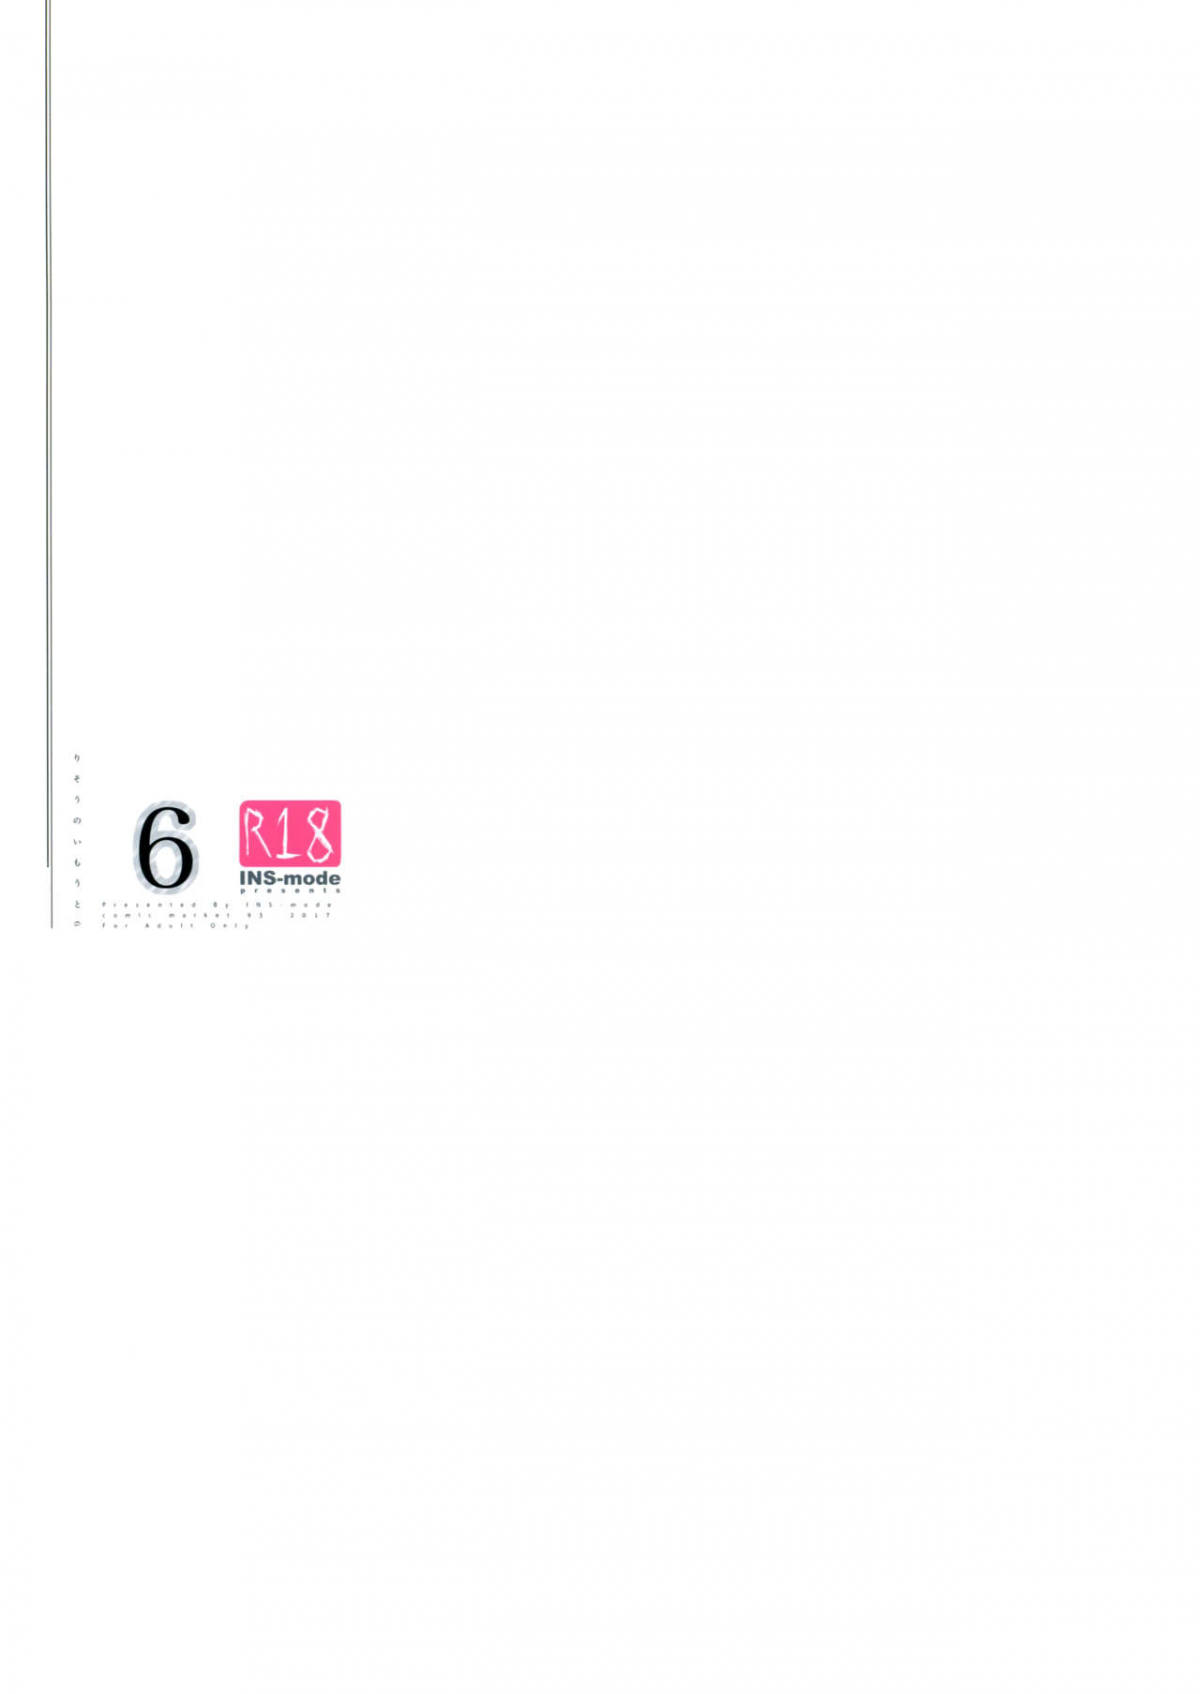 HentaiVN.net - Ảnh 19 - Risou no Imouto - Chap 6